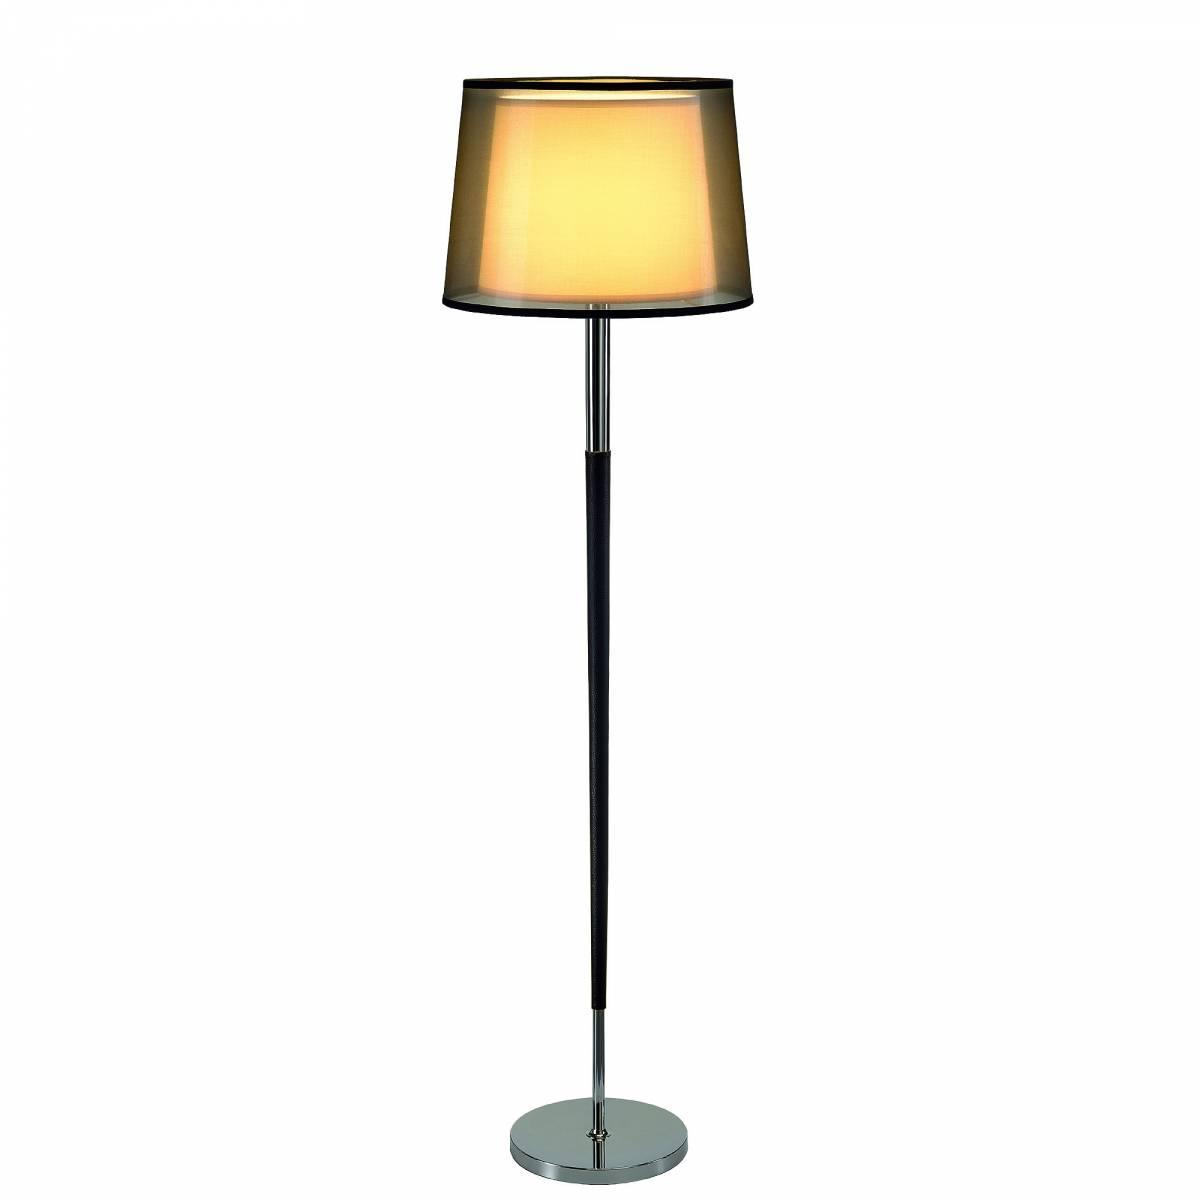 BISHADE SL-1 floor lamp, E27, max. 40W